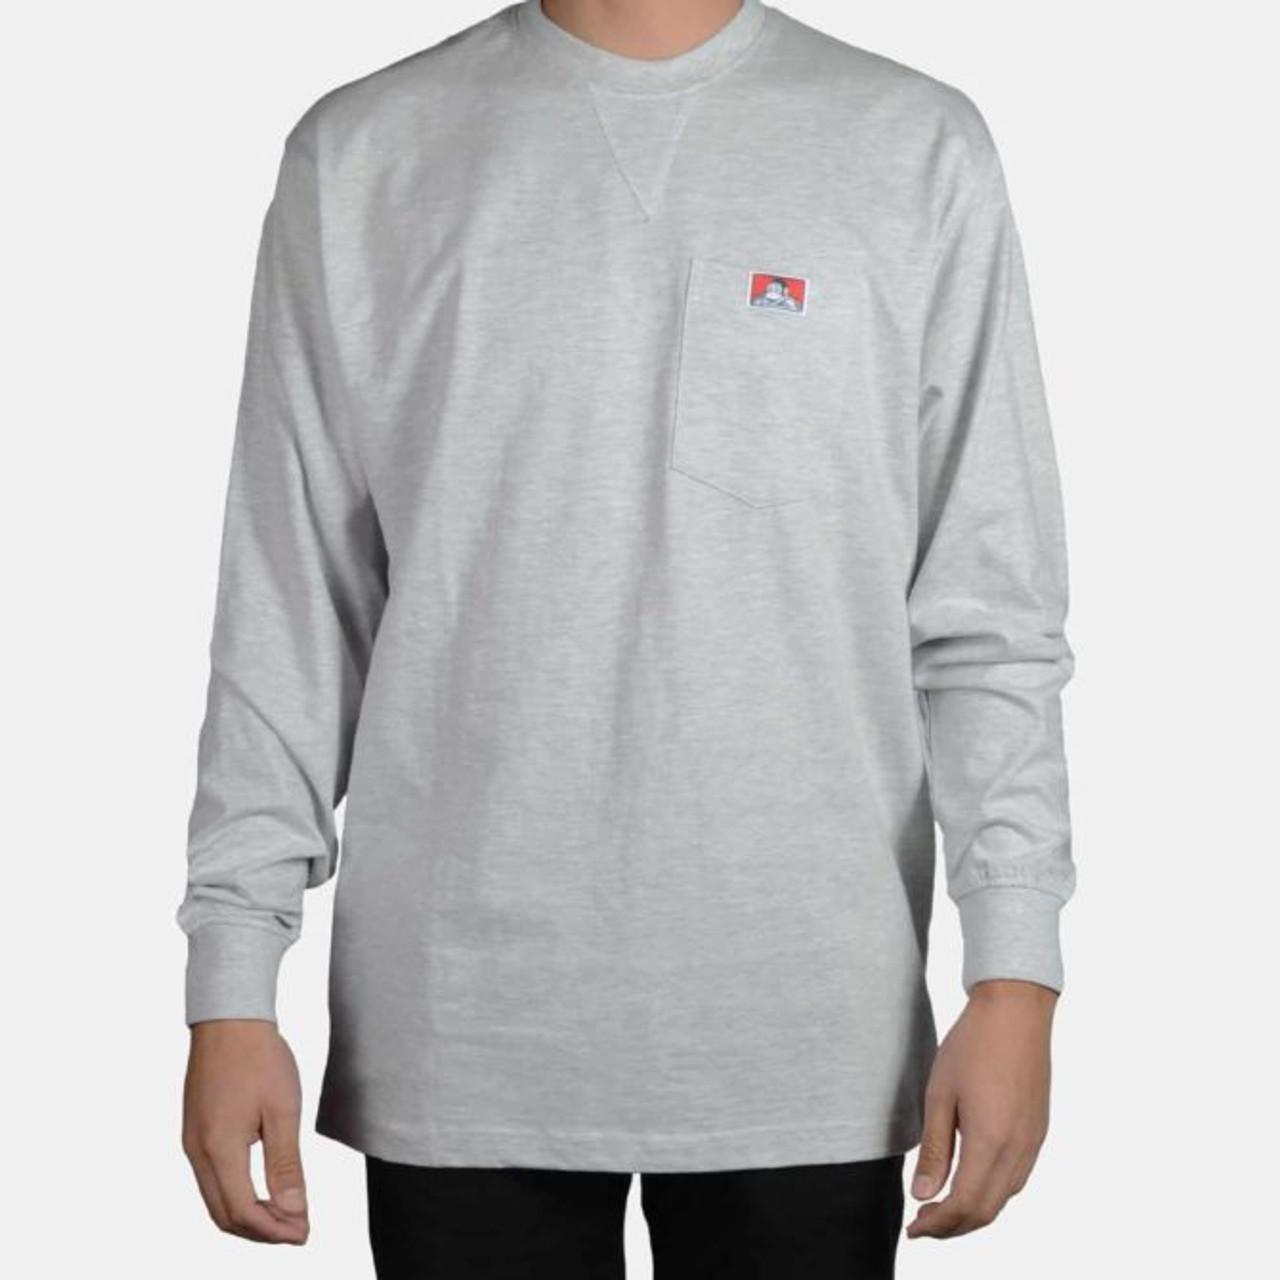 Ben Davis® Heavy Duty Long Sleeve Pocket T-Shirt